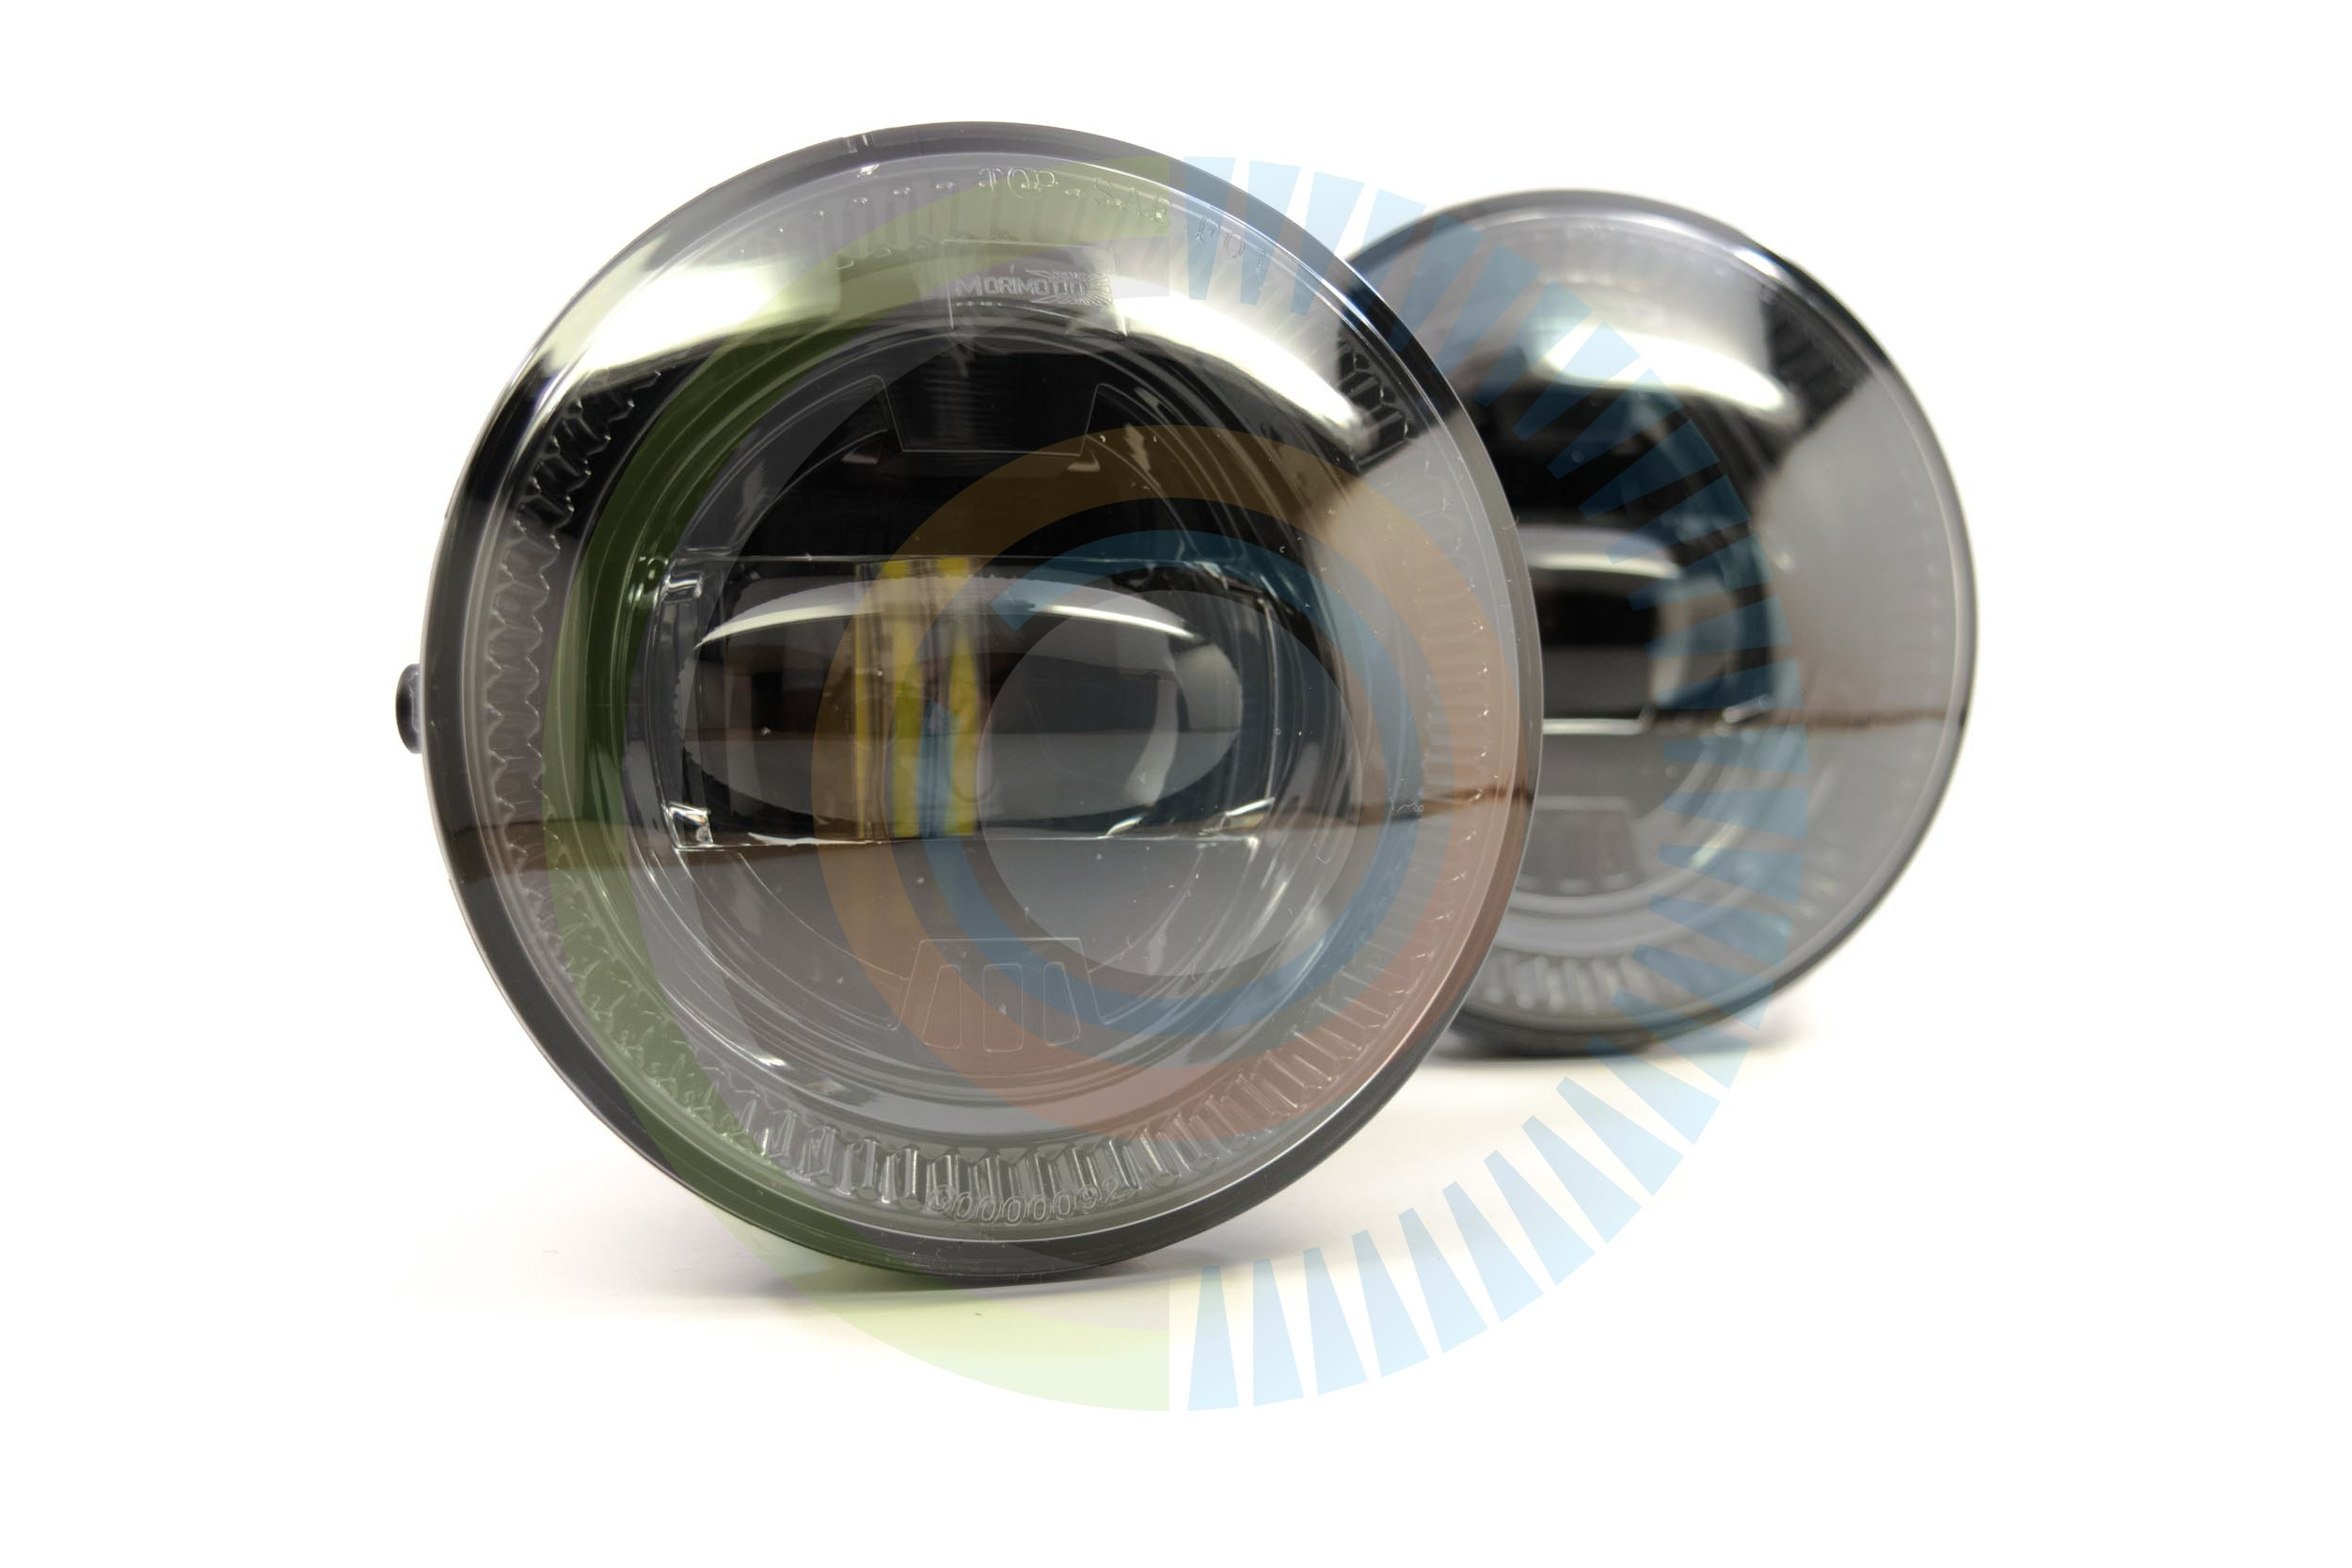 Morimoto XB LED Fog Lights - Toyota (Round)